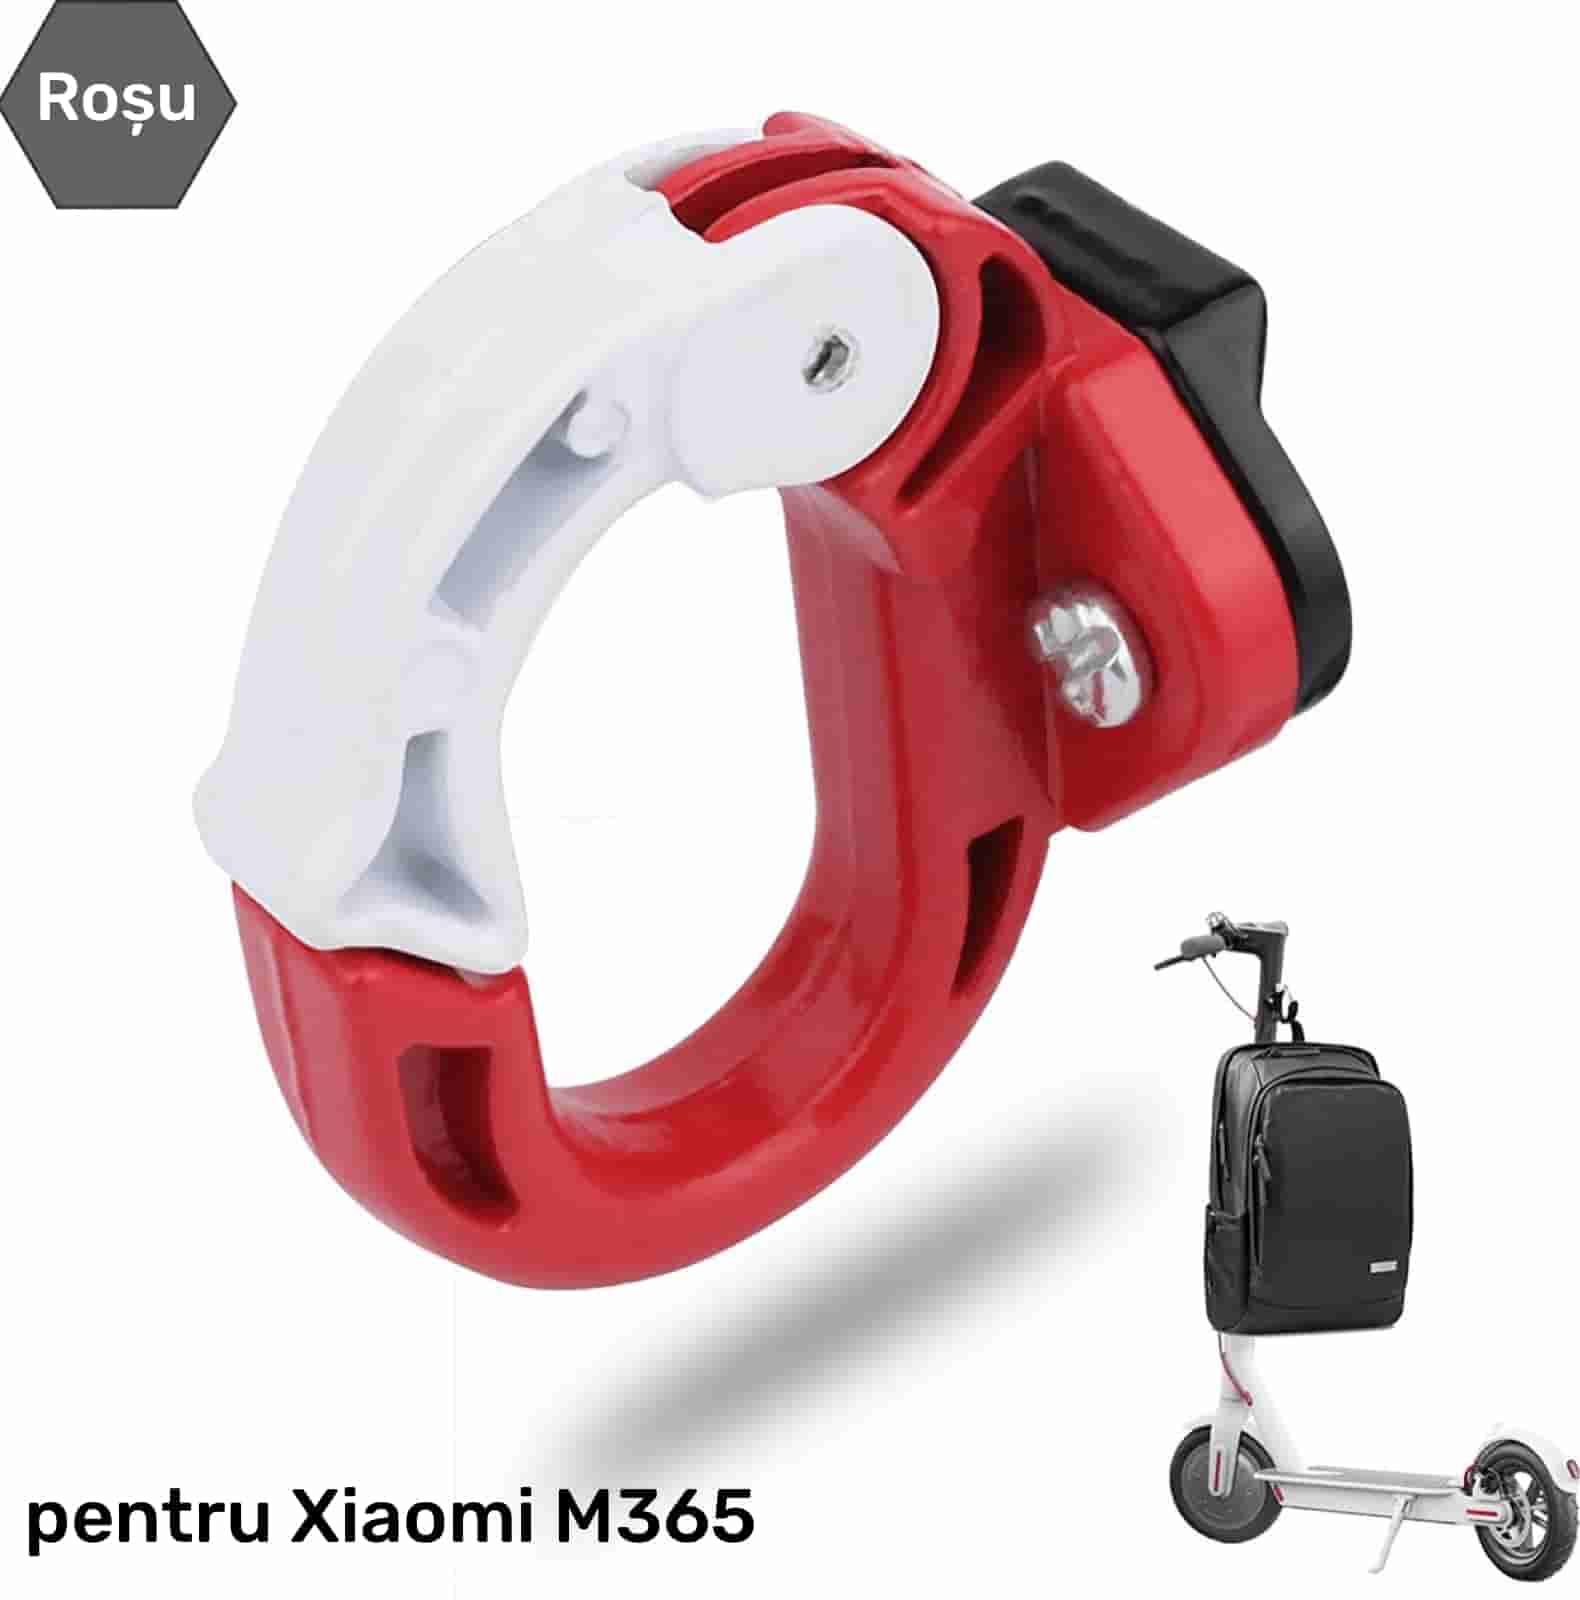 Cârlig frontal tip agățătoare suport trotineta electrică Xiaomi M365 PRO 1